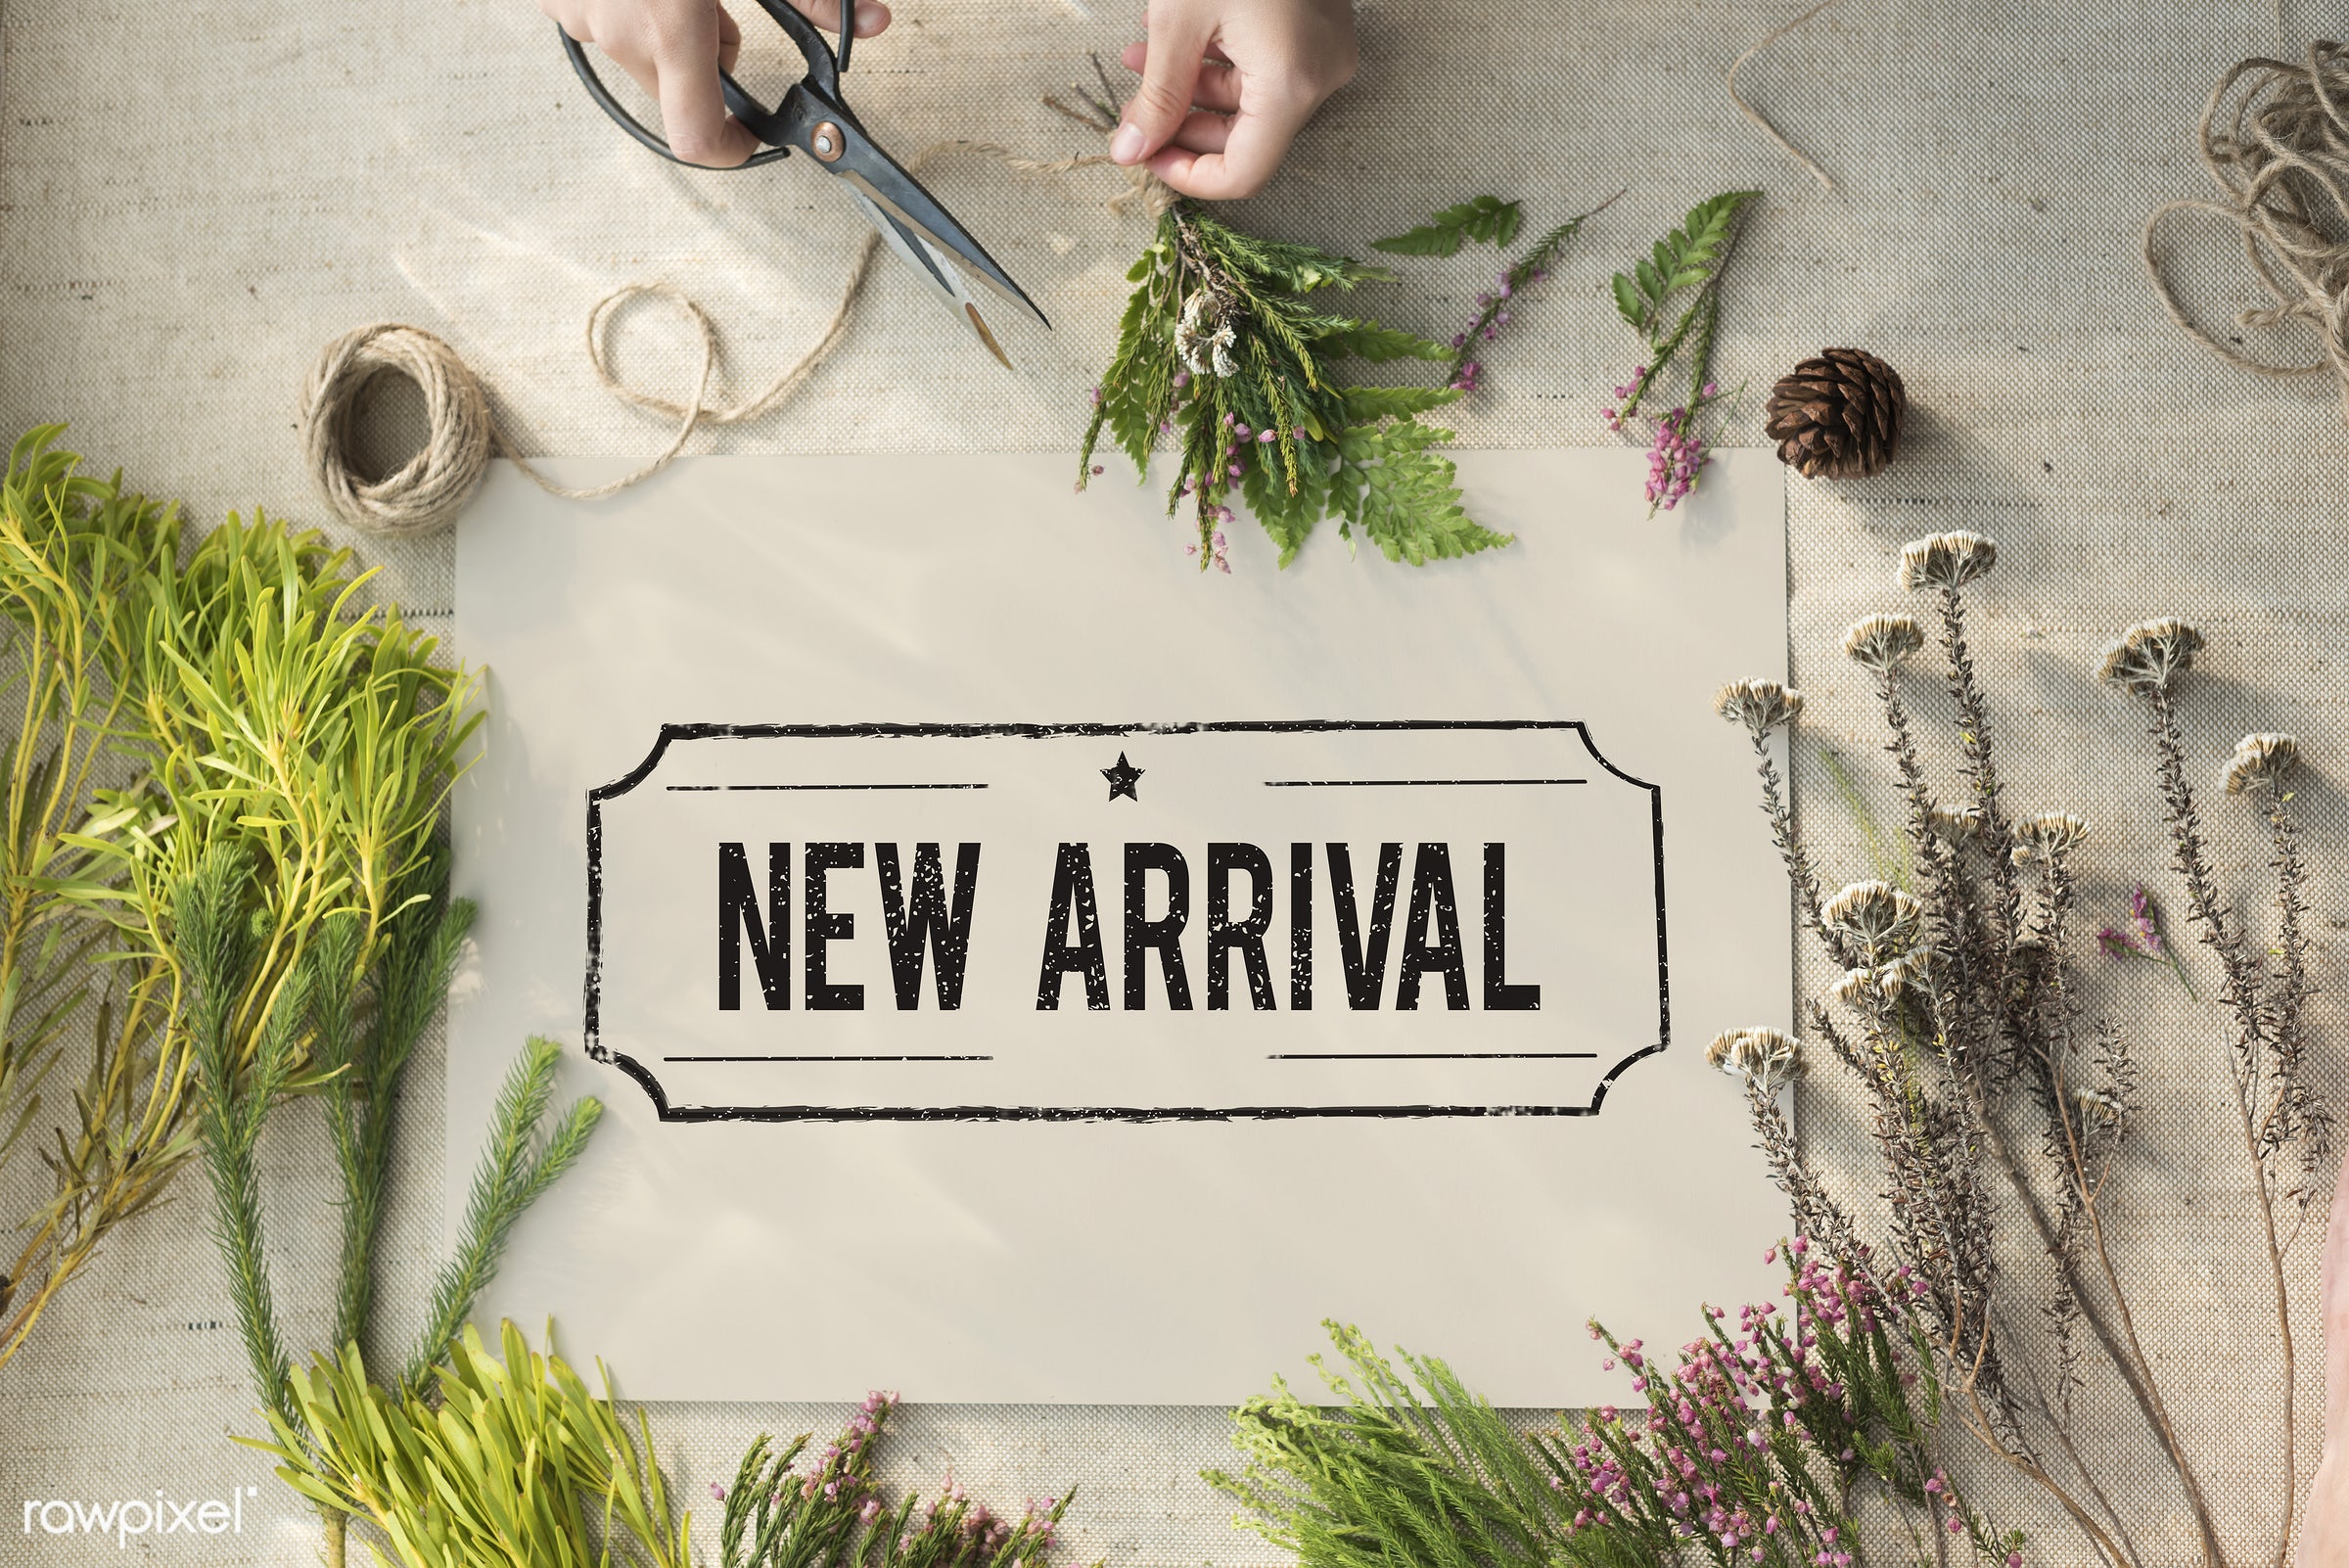 advanced, arrival, artistic, arts, arts and craft, be creative, breaking new ground, craft, create, creative, creativity,...